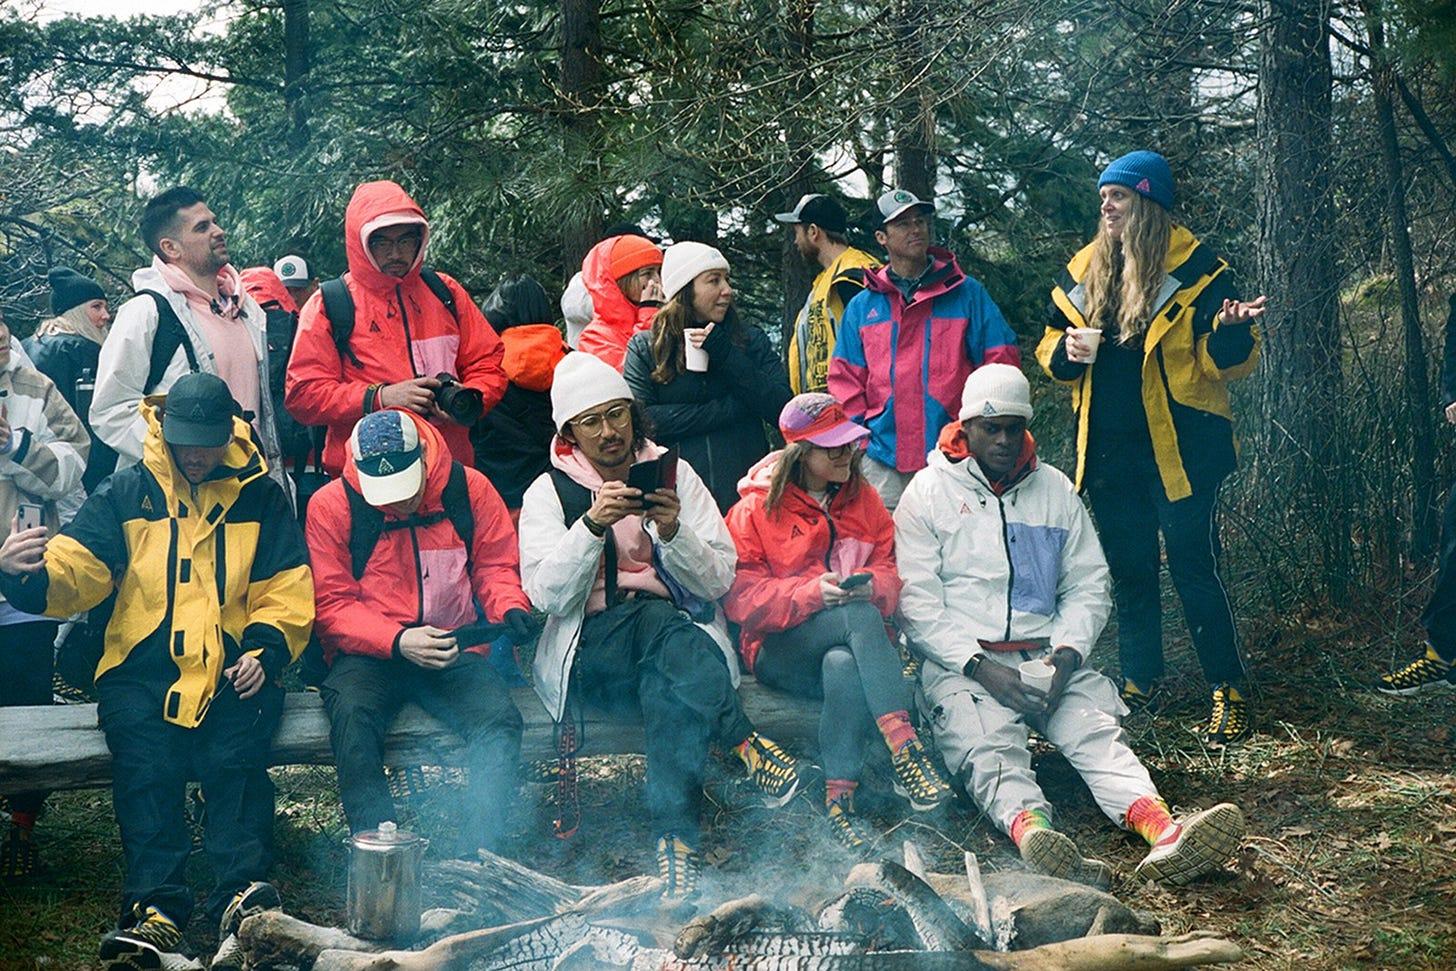 nike acg james azumi director interview James Arizumi Nike ACG React Terra Gobe outdoors